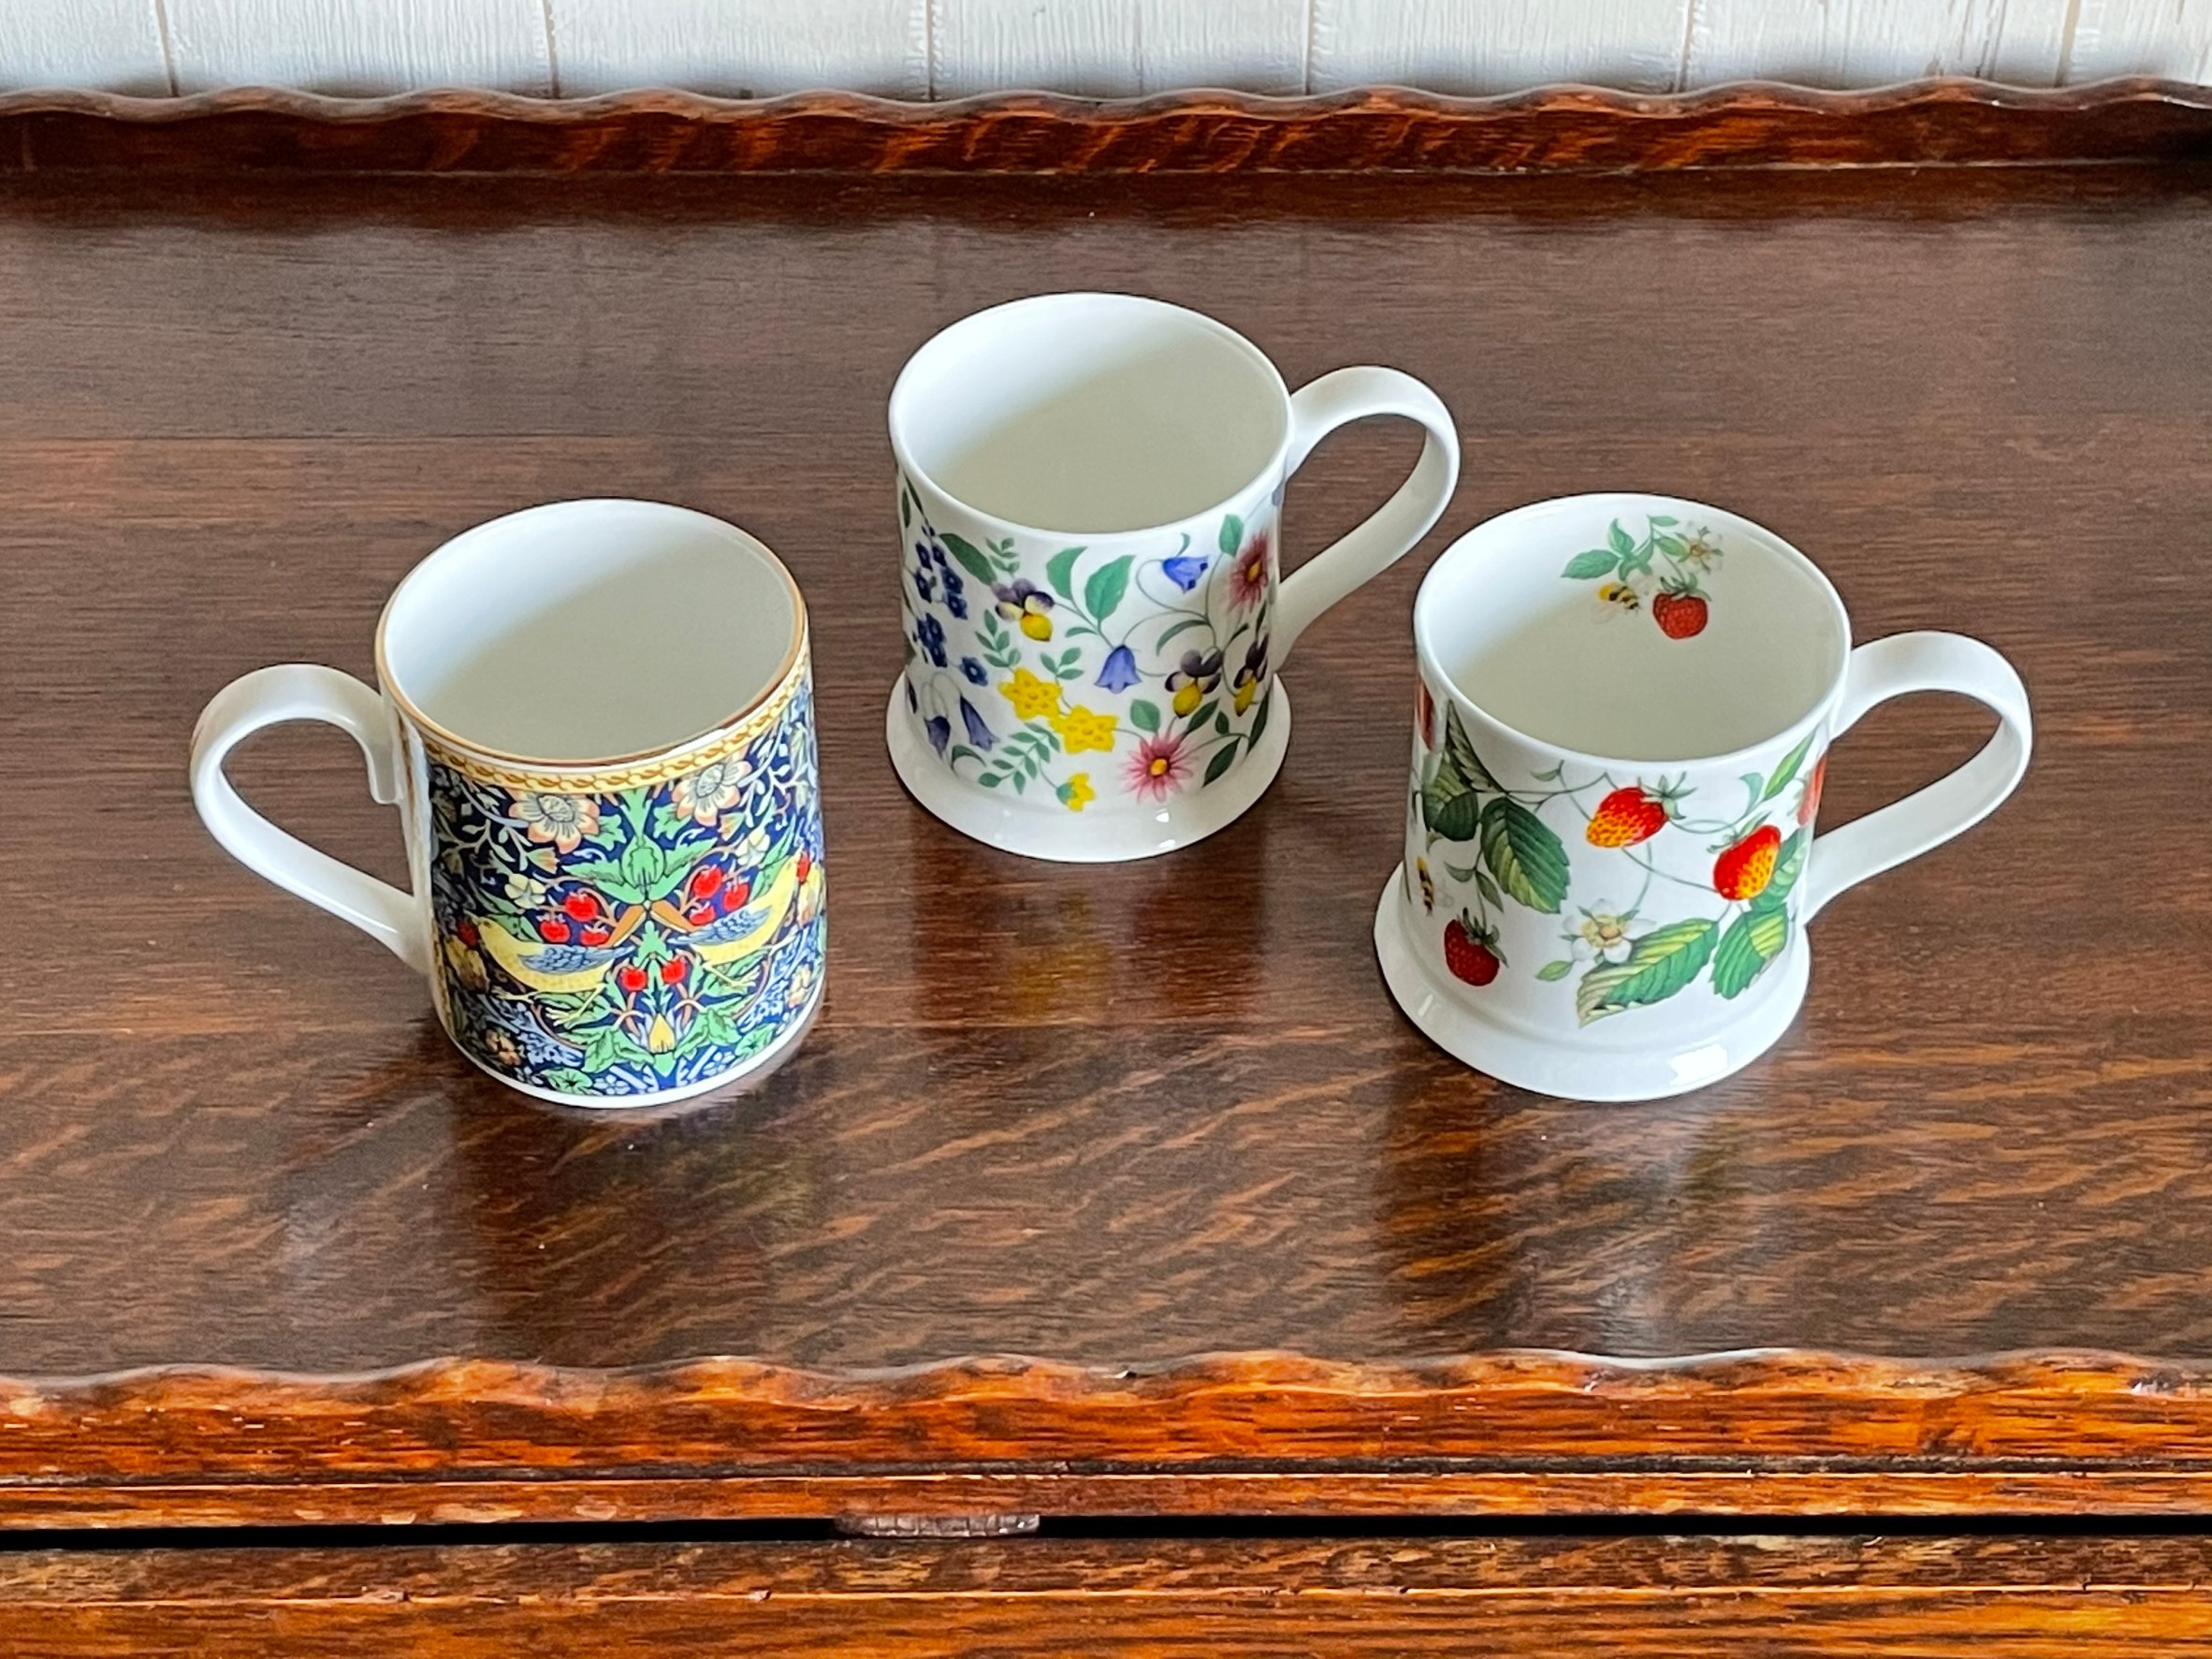 Roy kirkham Mug Cup ウィリアムモリス